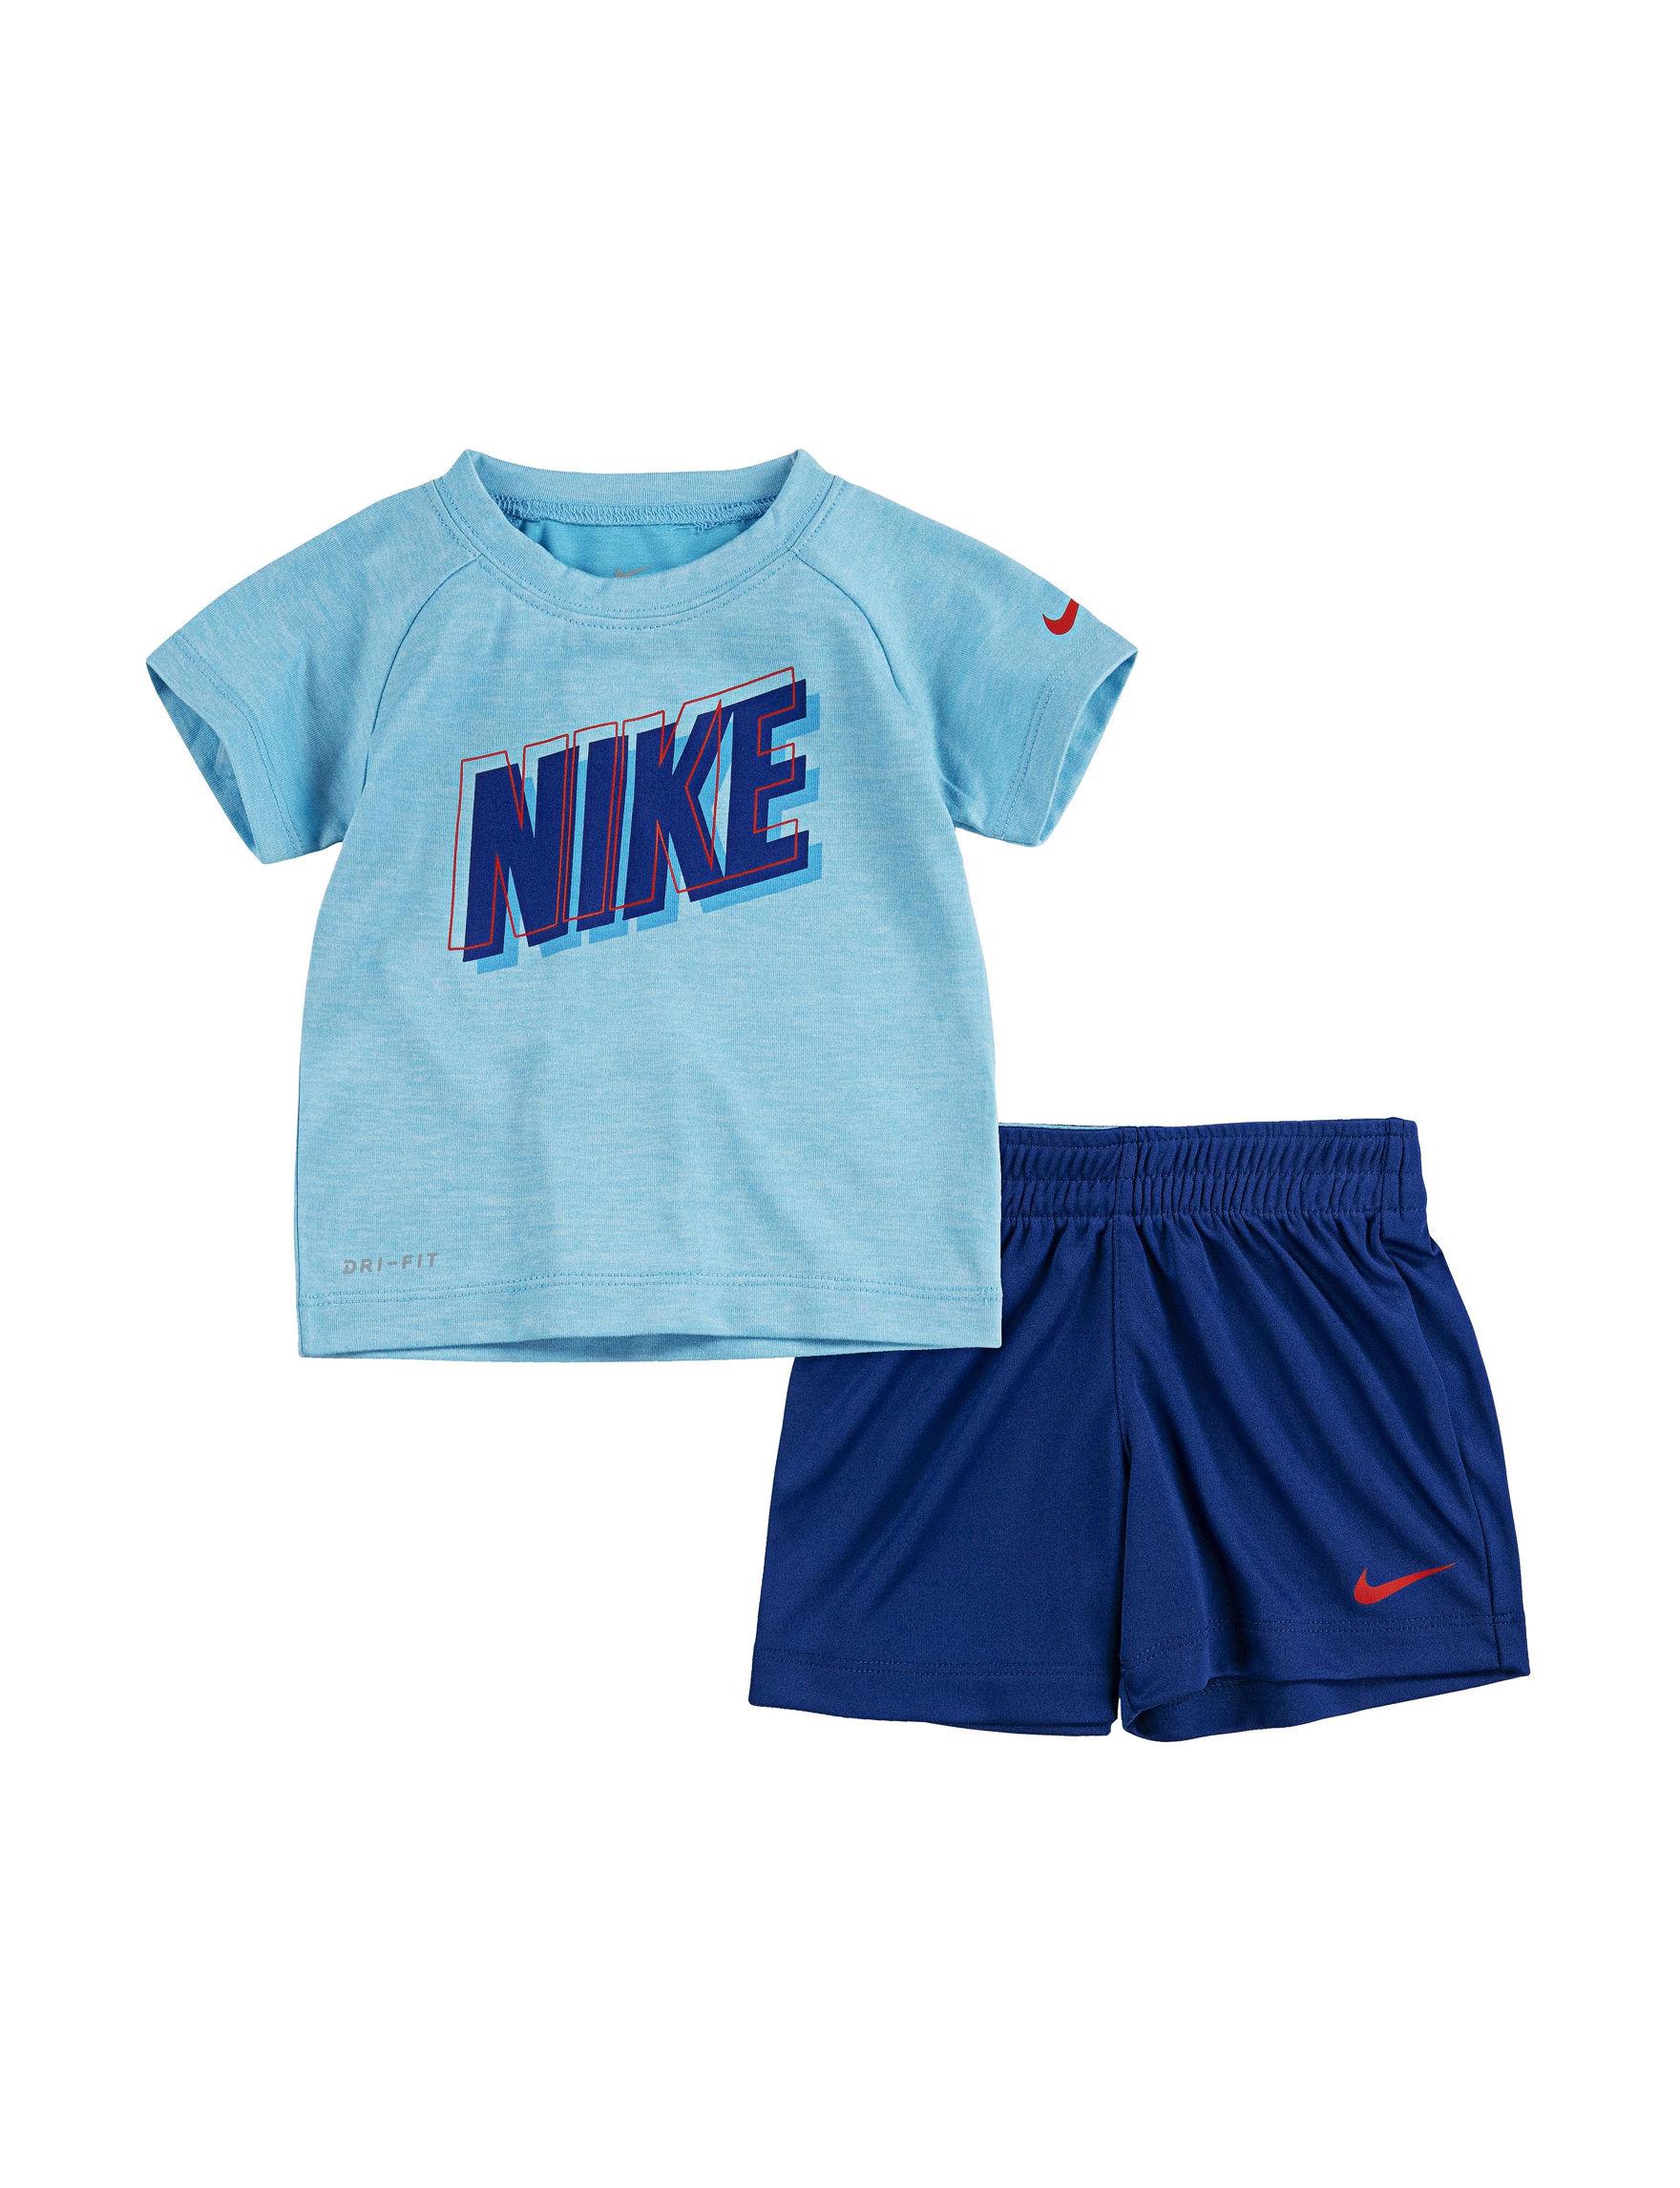 Nike Blue / Red